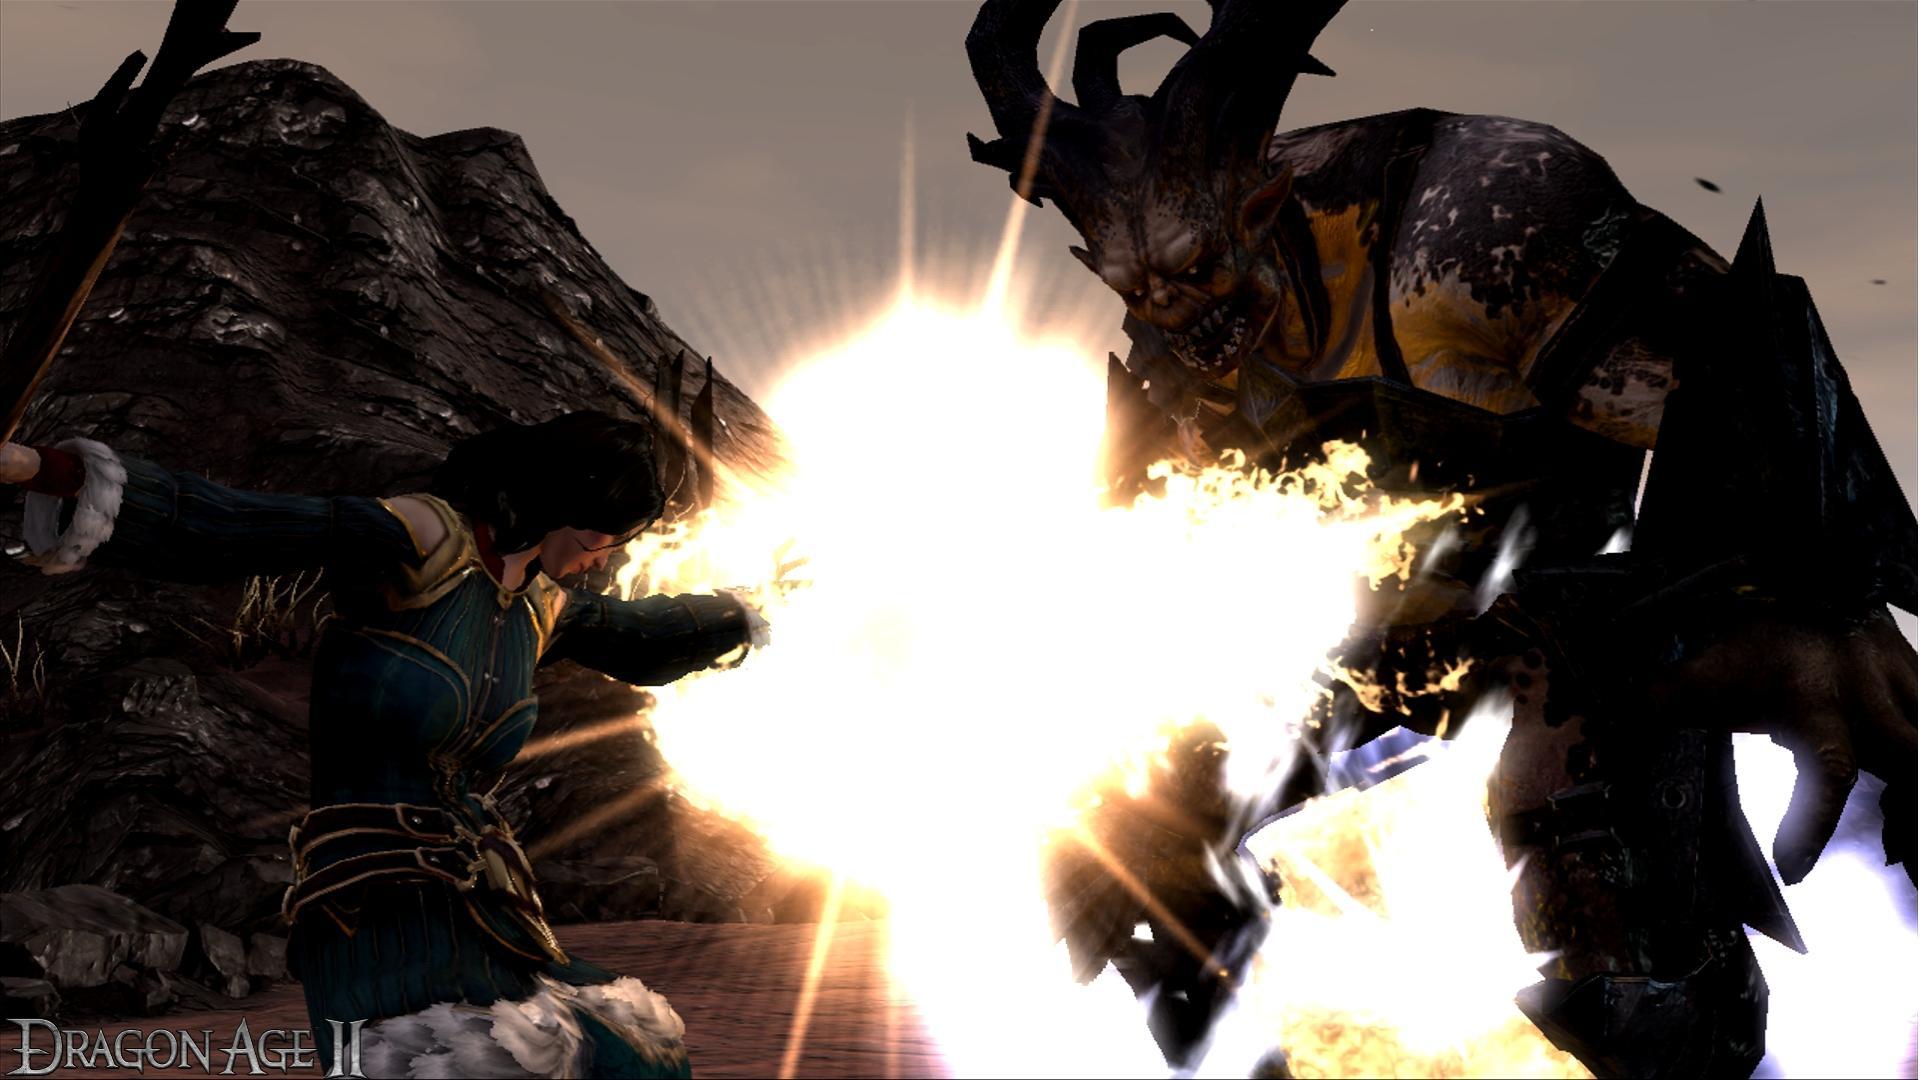 Dragon Age II – Ferelden opět potřebuje hrdinu 13113